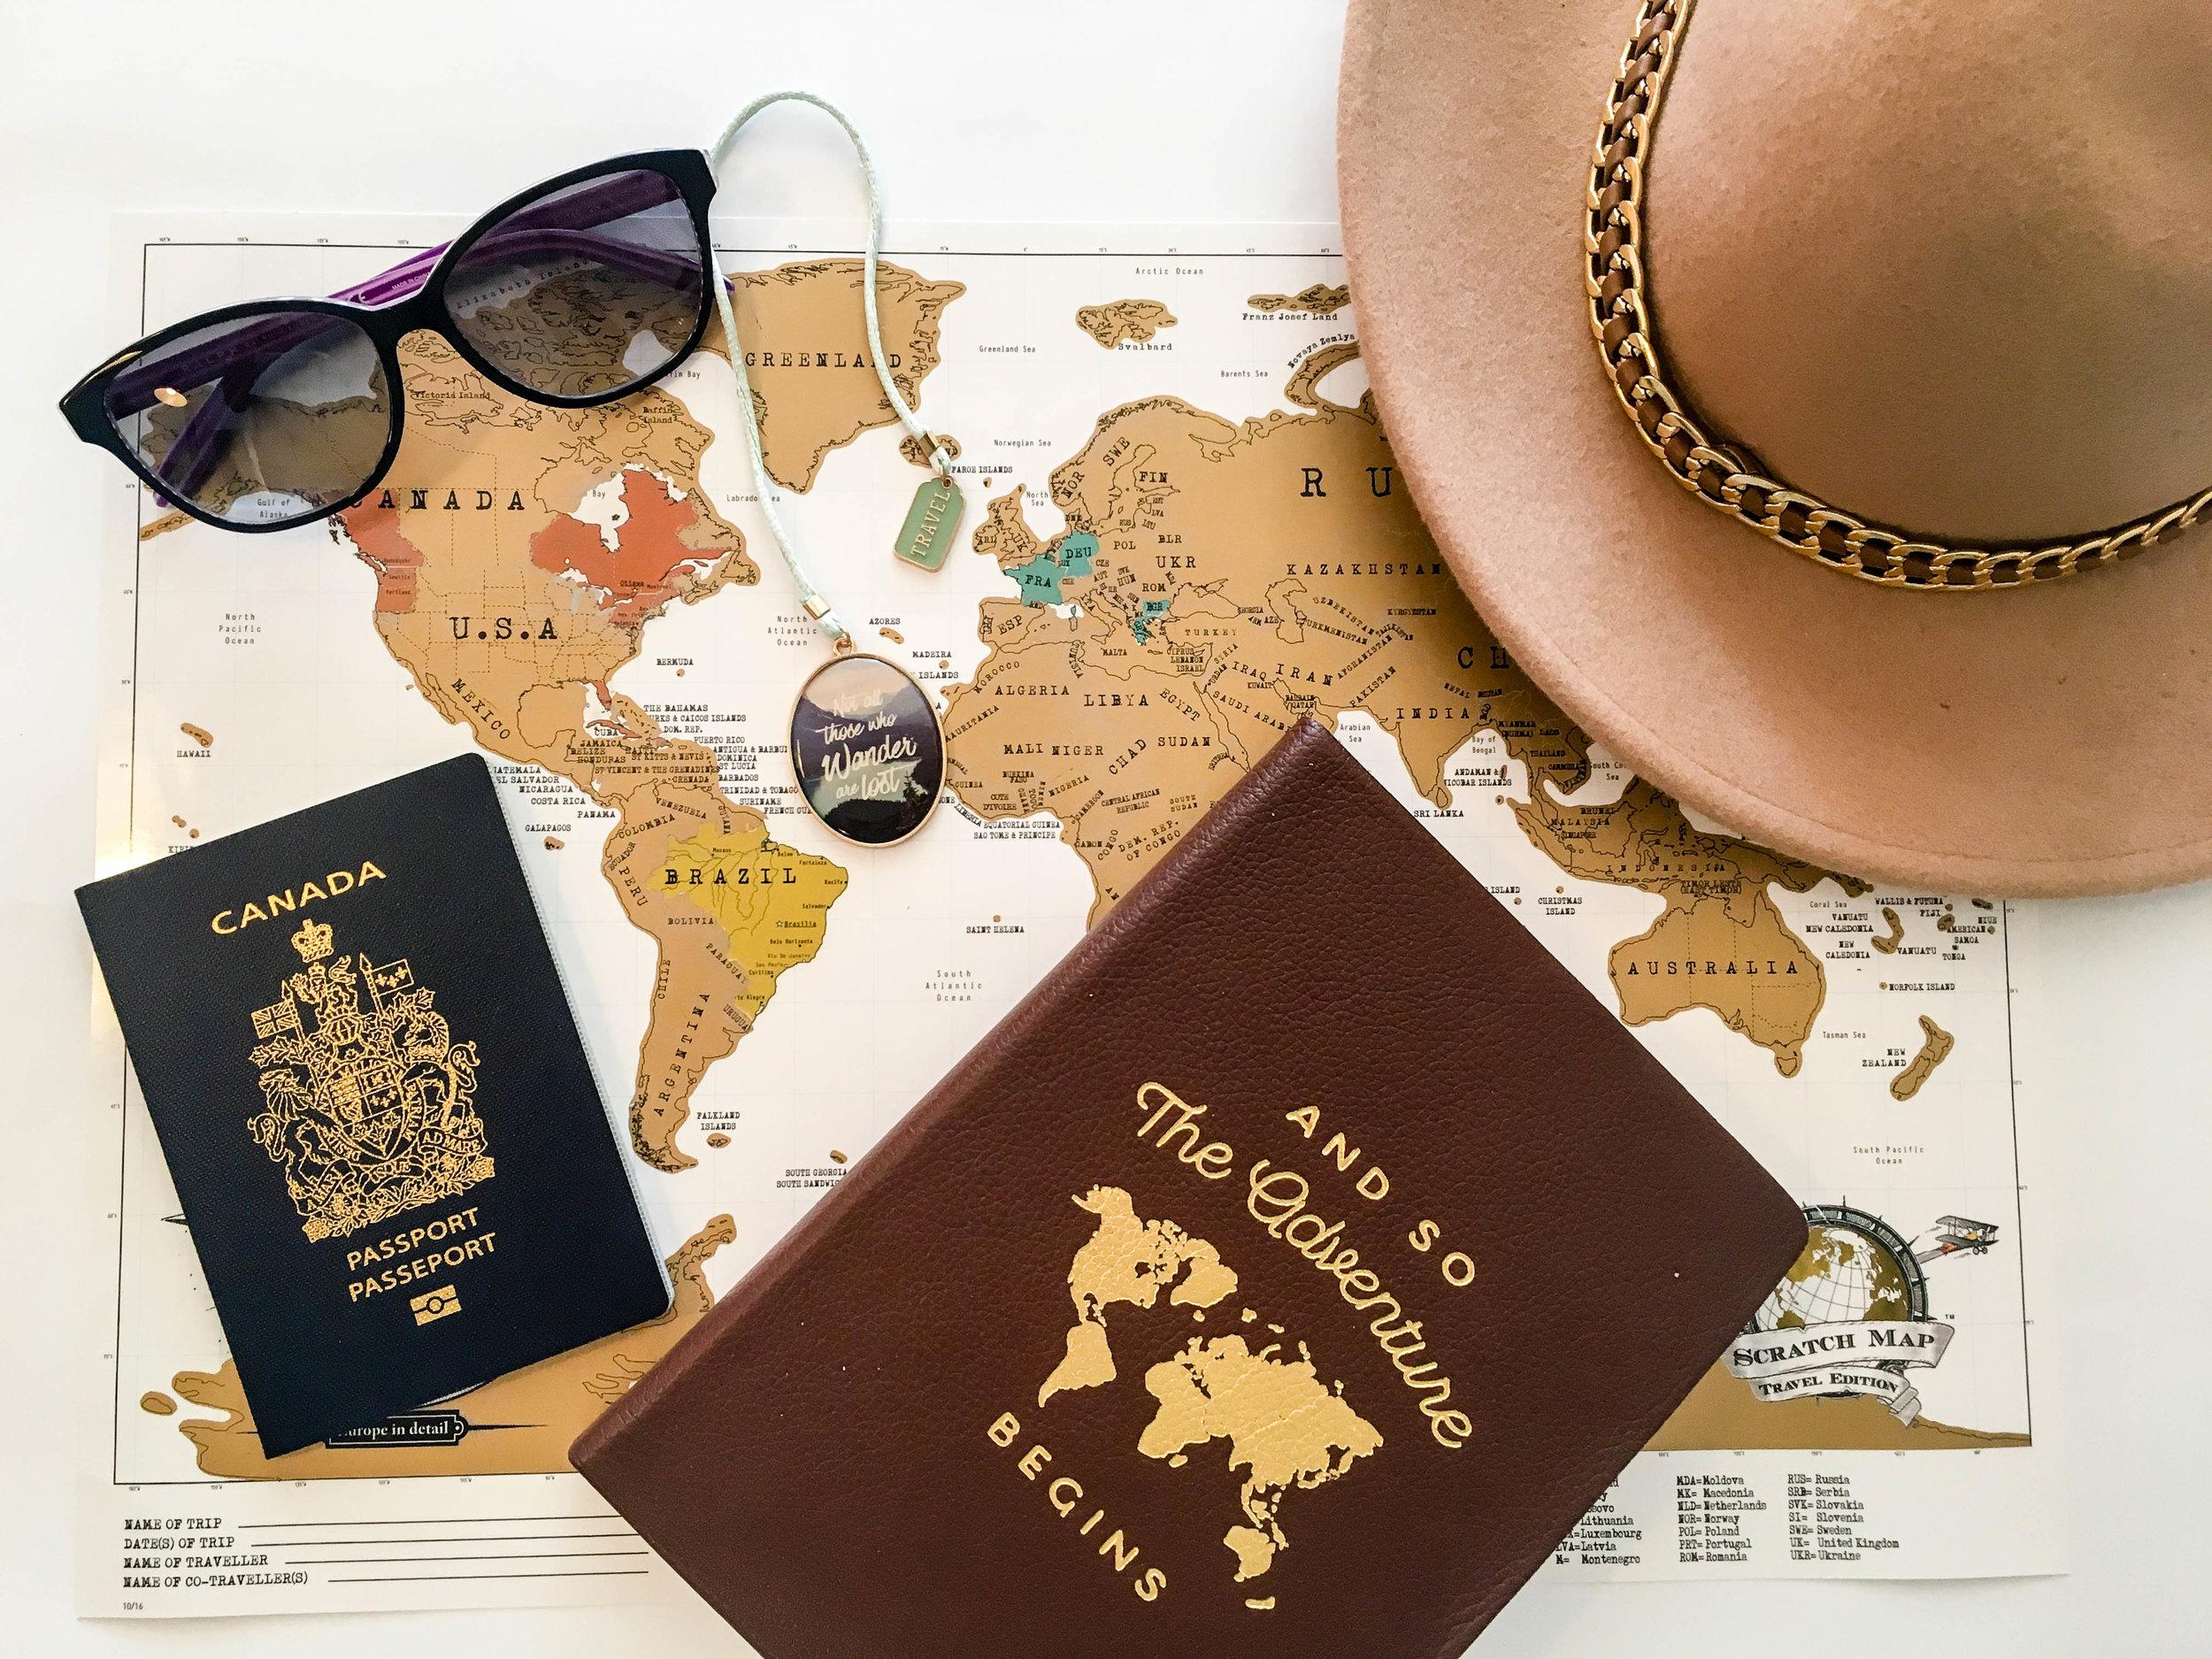 Vacation savings plan. Flat lay of a map, a passport, sunglasses, a hat ans a notebook